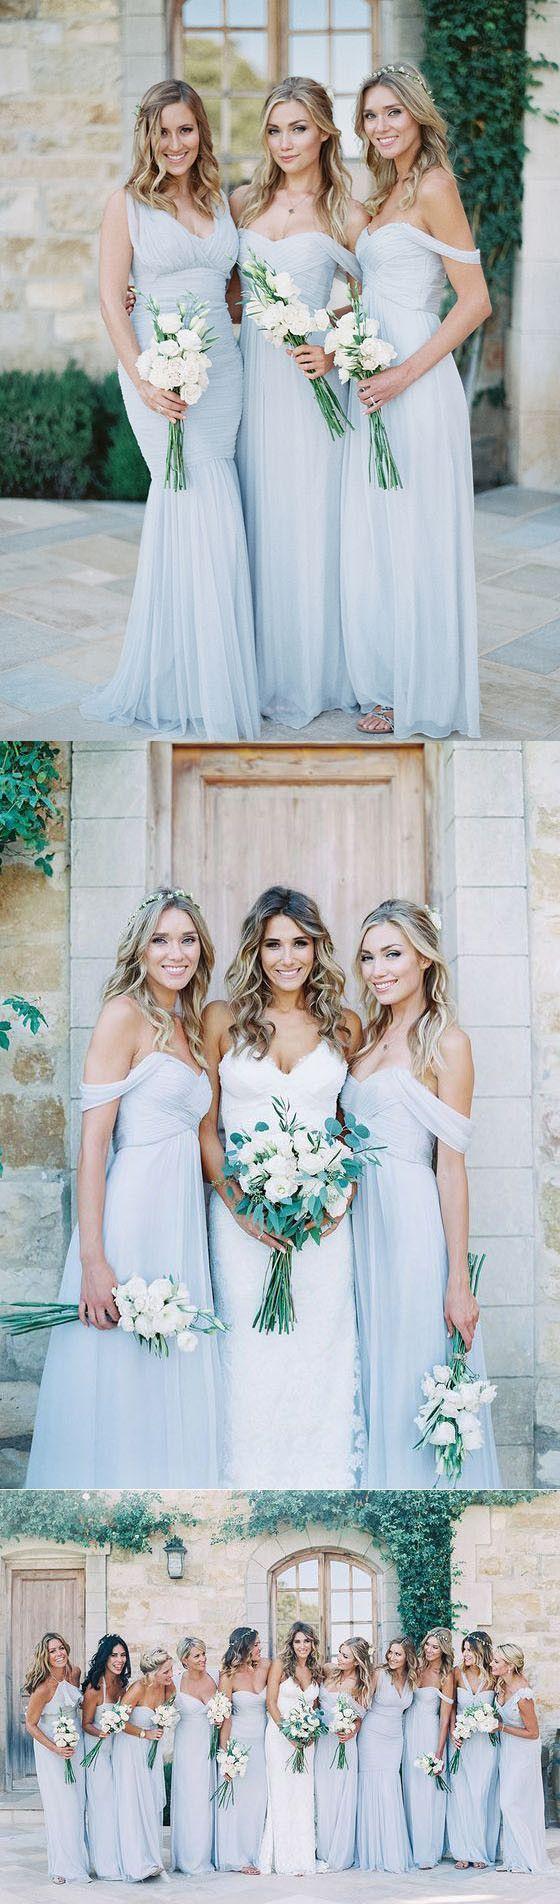 Charming blue chiffon bridesmaid dresslong floor length bridesmaid